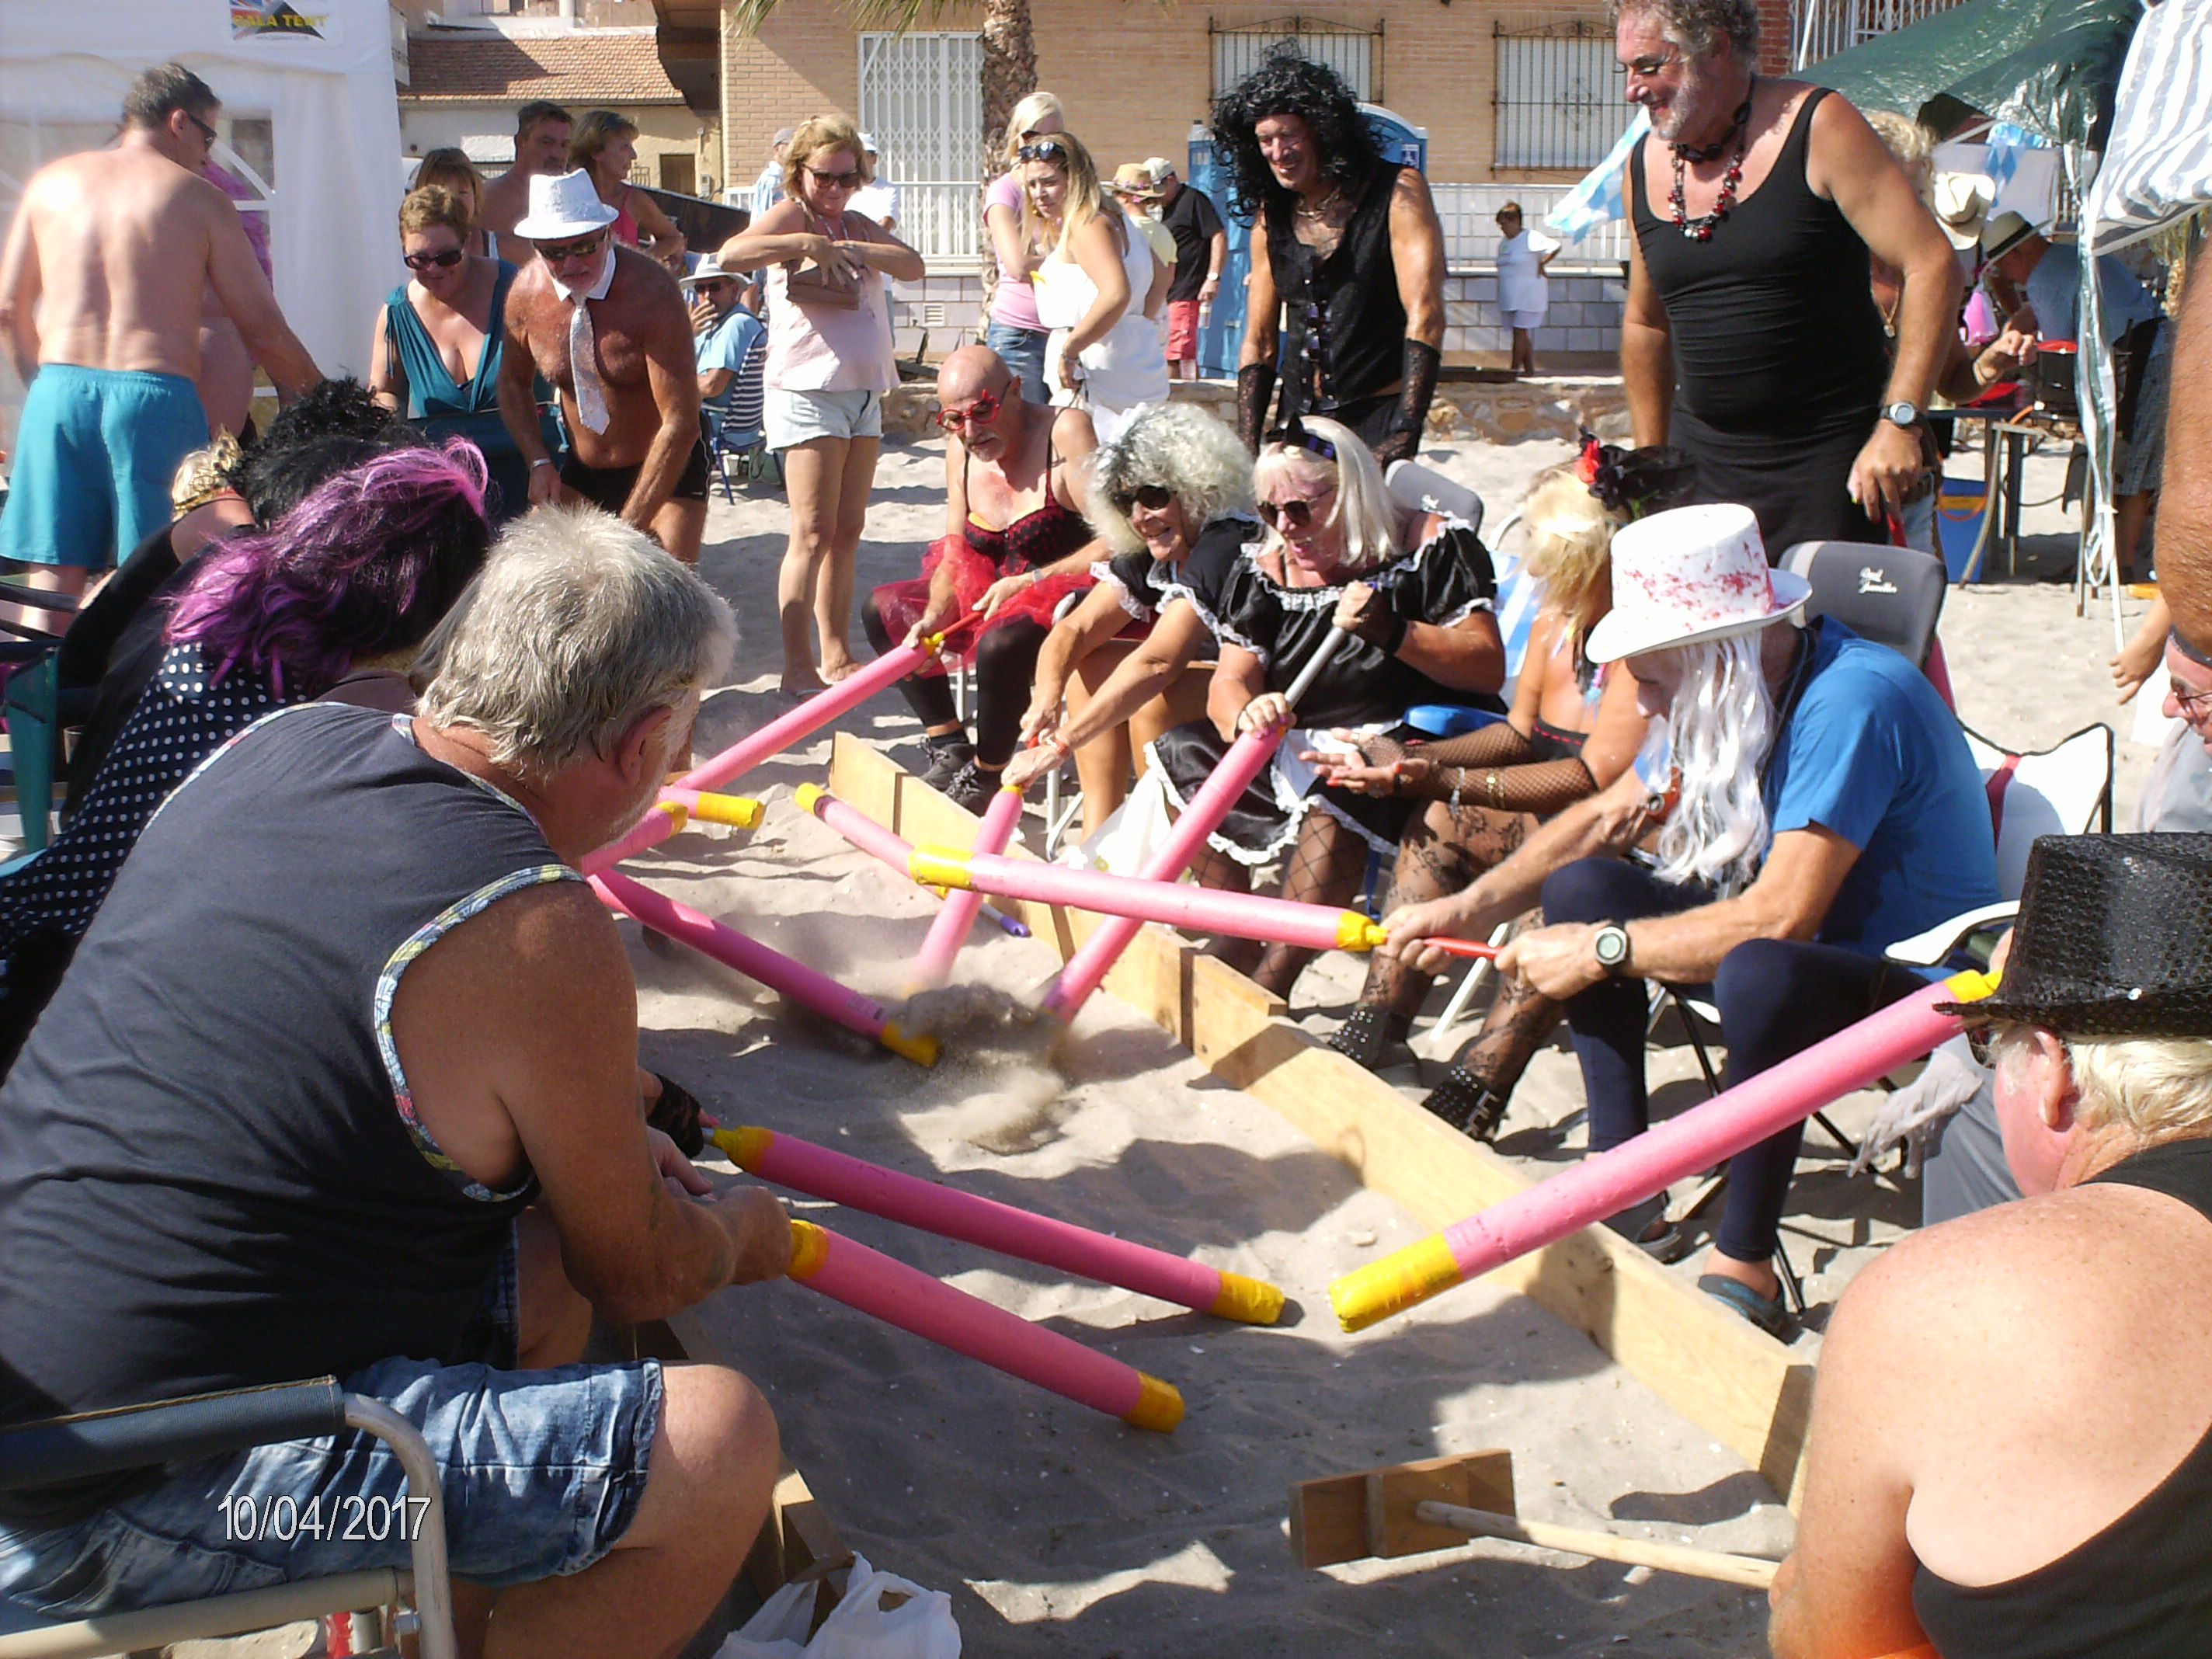 SAMM Members Party at Caldero Day